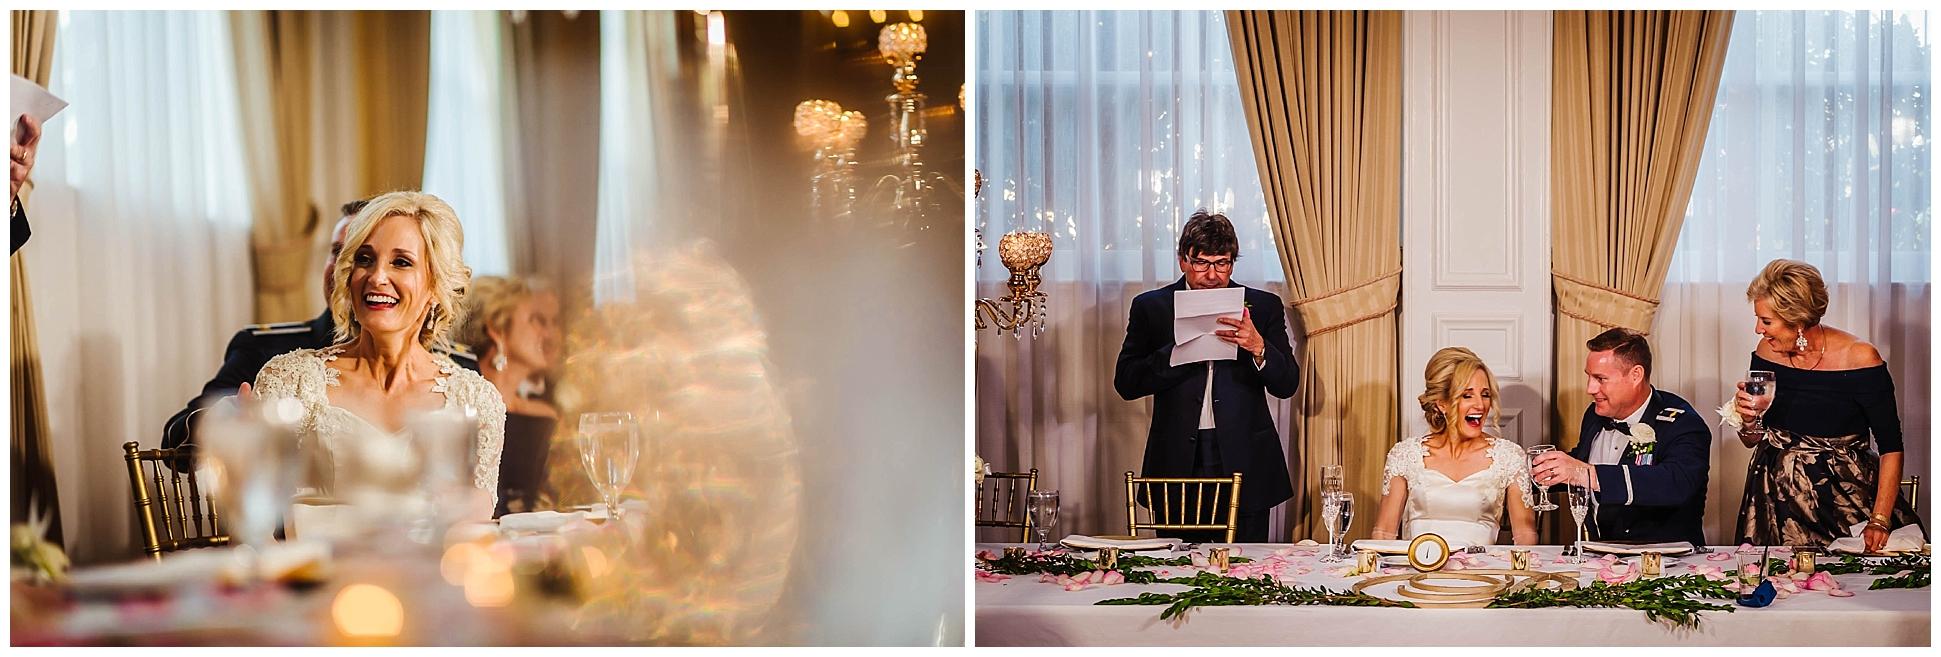 tampa-wedding-photographer-sleeves-palma-ceia-country-club-golf-course-sunset-luxury_0091.jpg